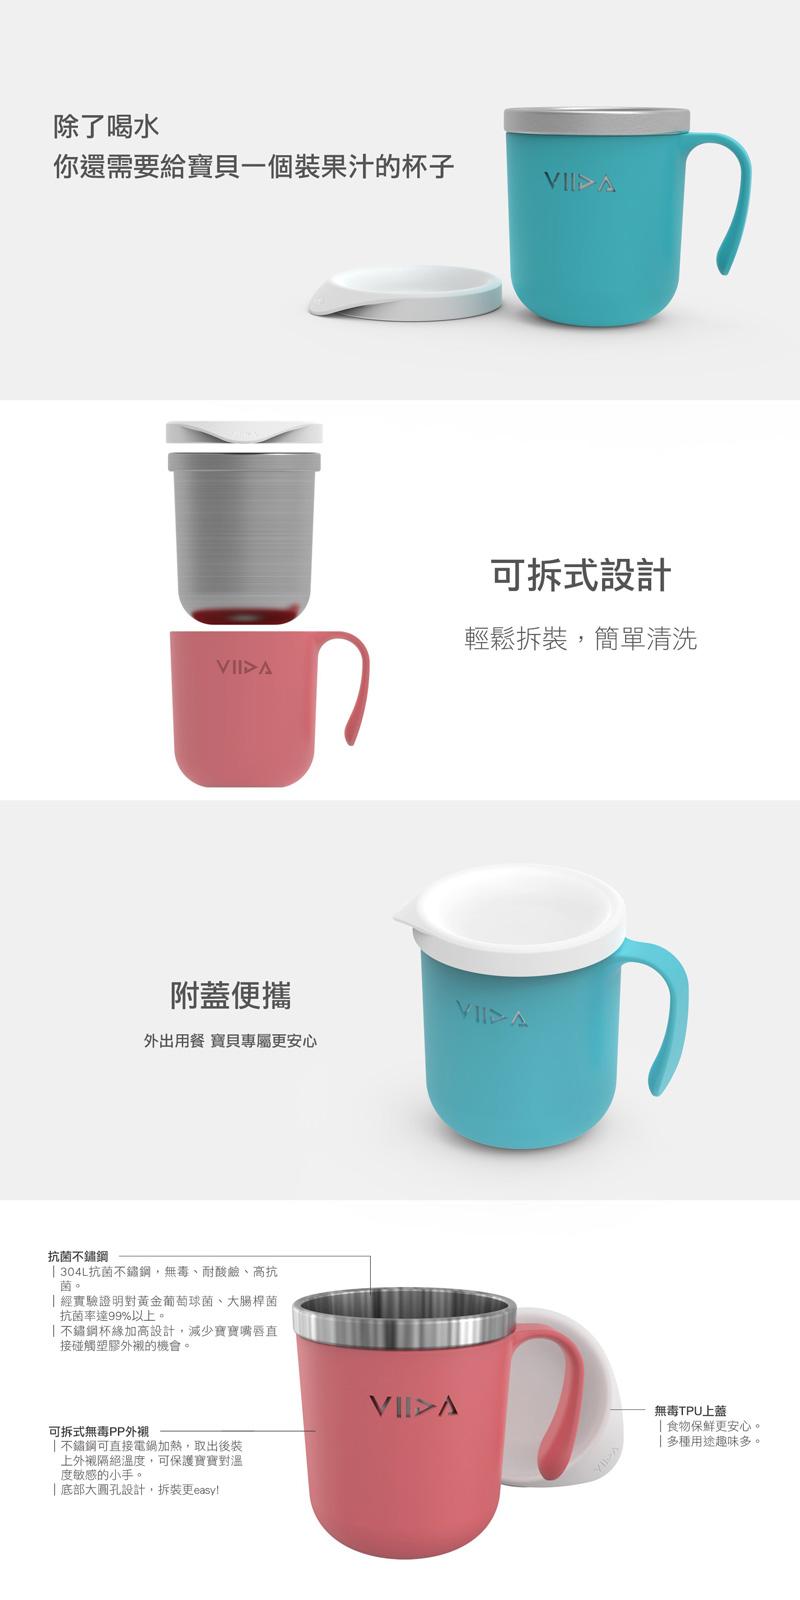 viida-Souffle-cup-info01